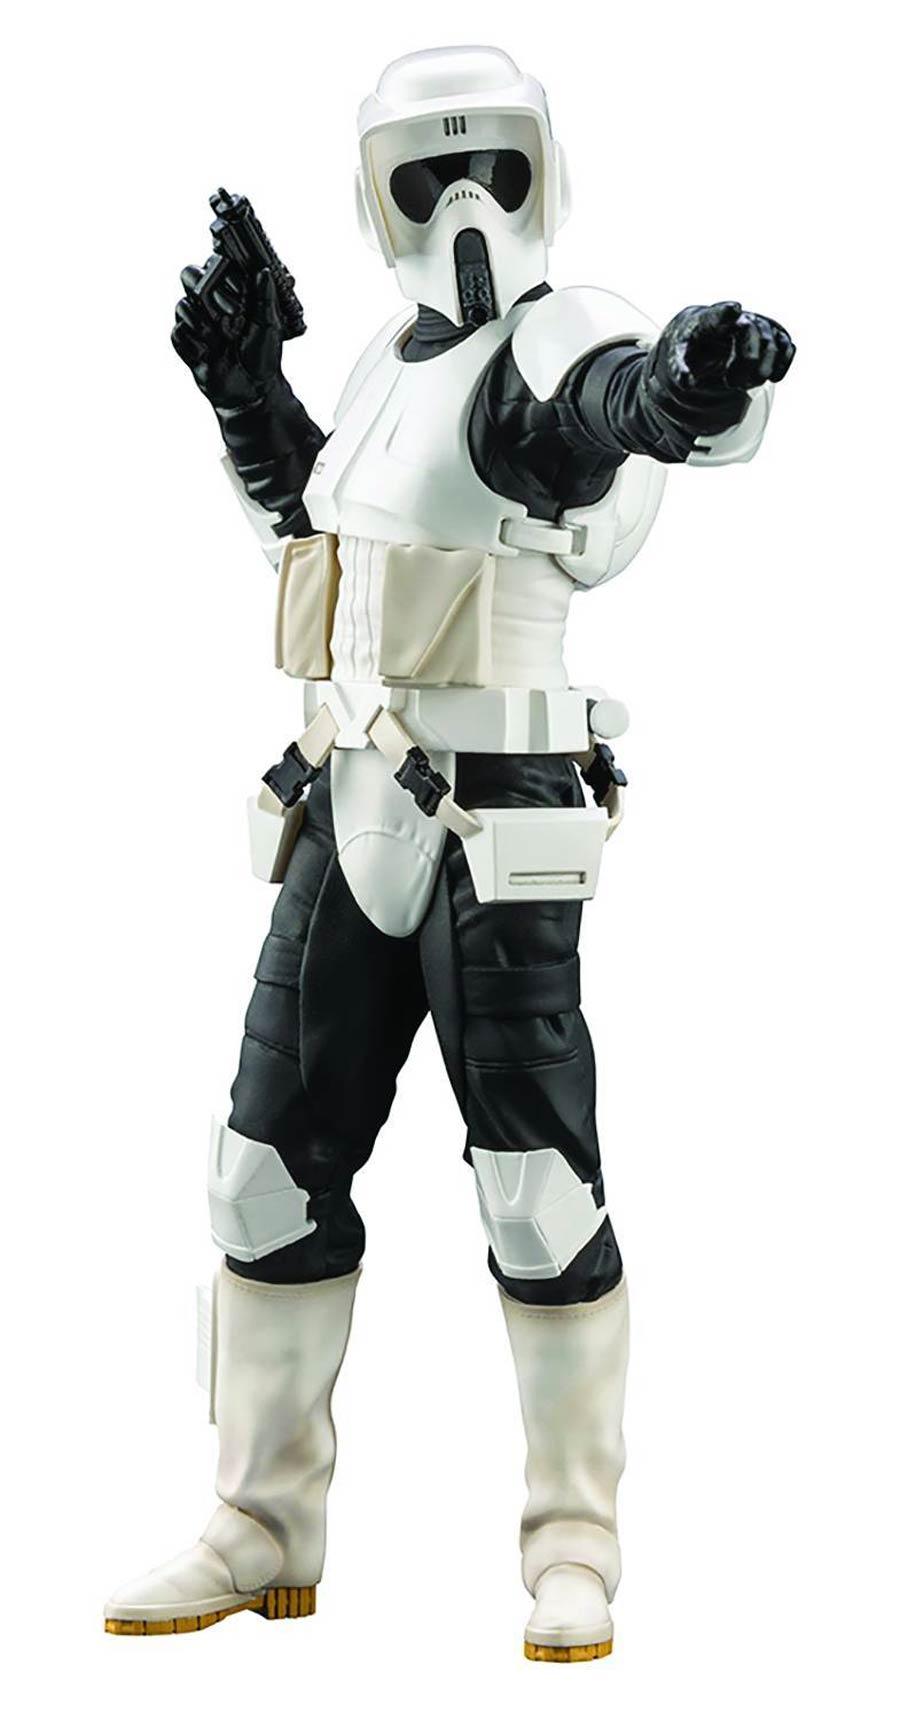 Star Wars Return Of The Jedi Scout Trooper ARTFX Plus Statue